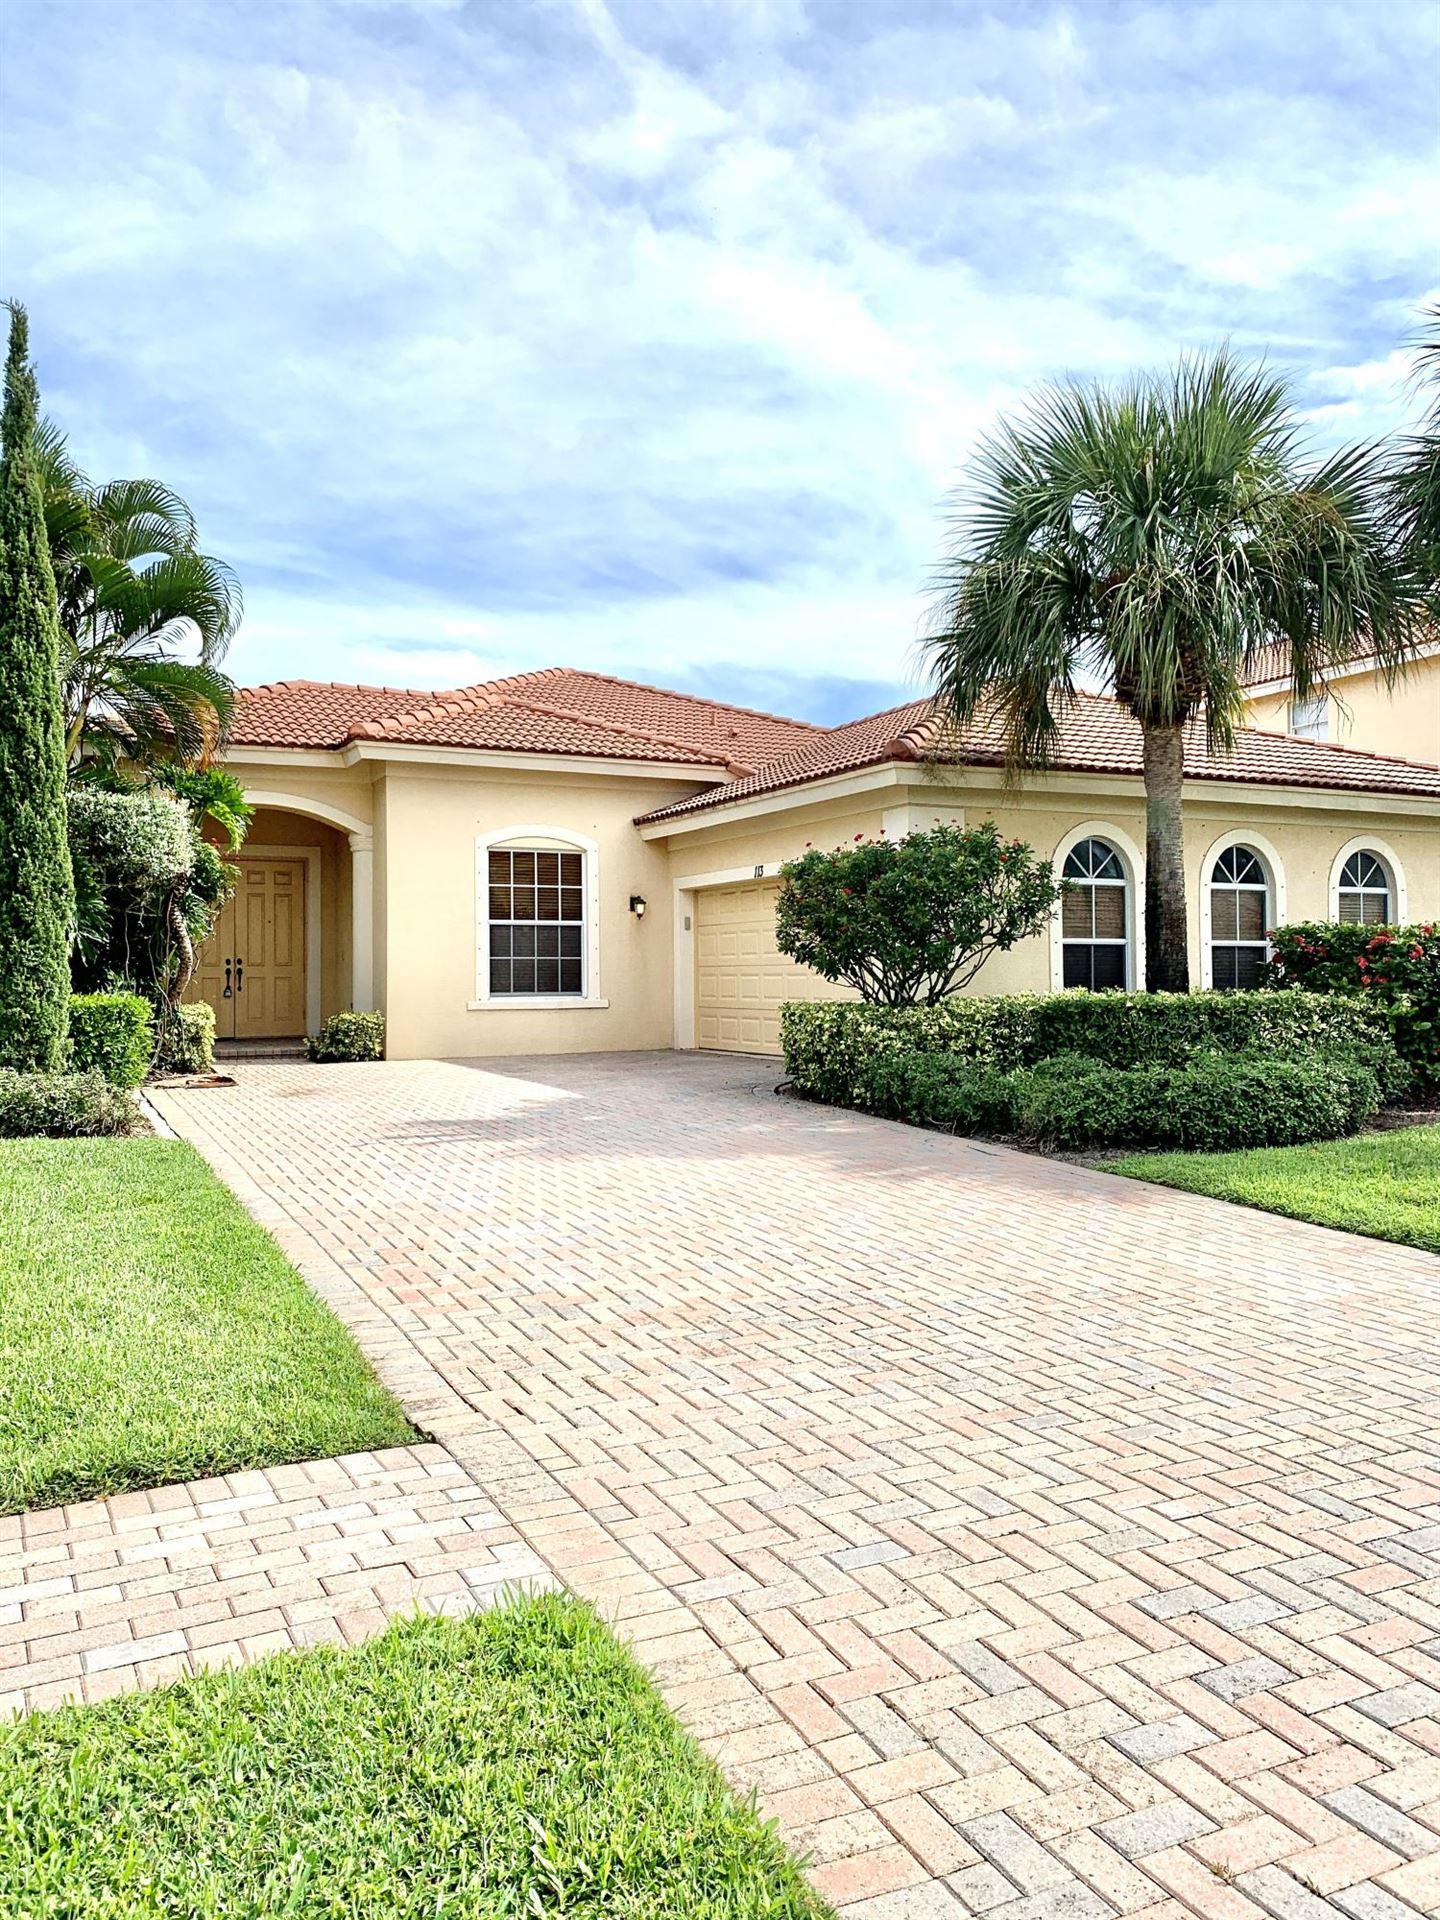 Photo of 113 Isola Circle, Royal Palm Beach, FL 33411 (MLS # RX-10646971)